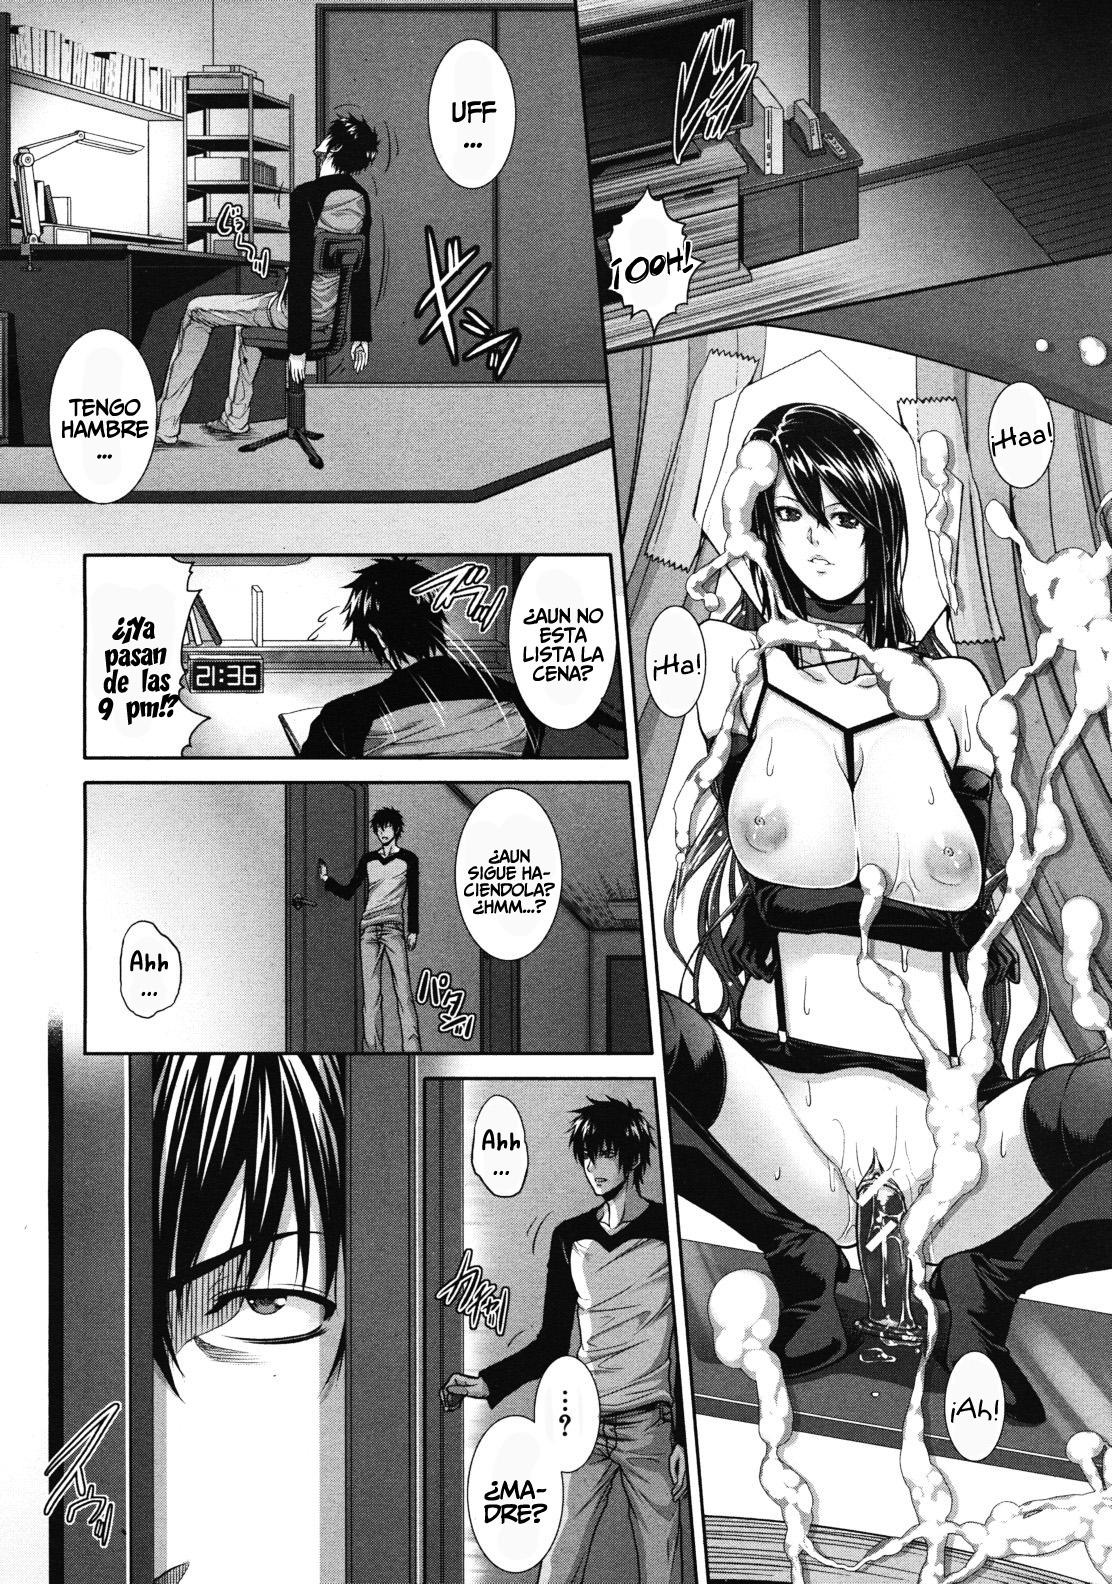 Ics Porno Gratis Hen Milftoons Mom Son In Carteles Anime Drago